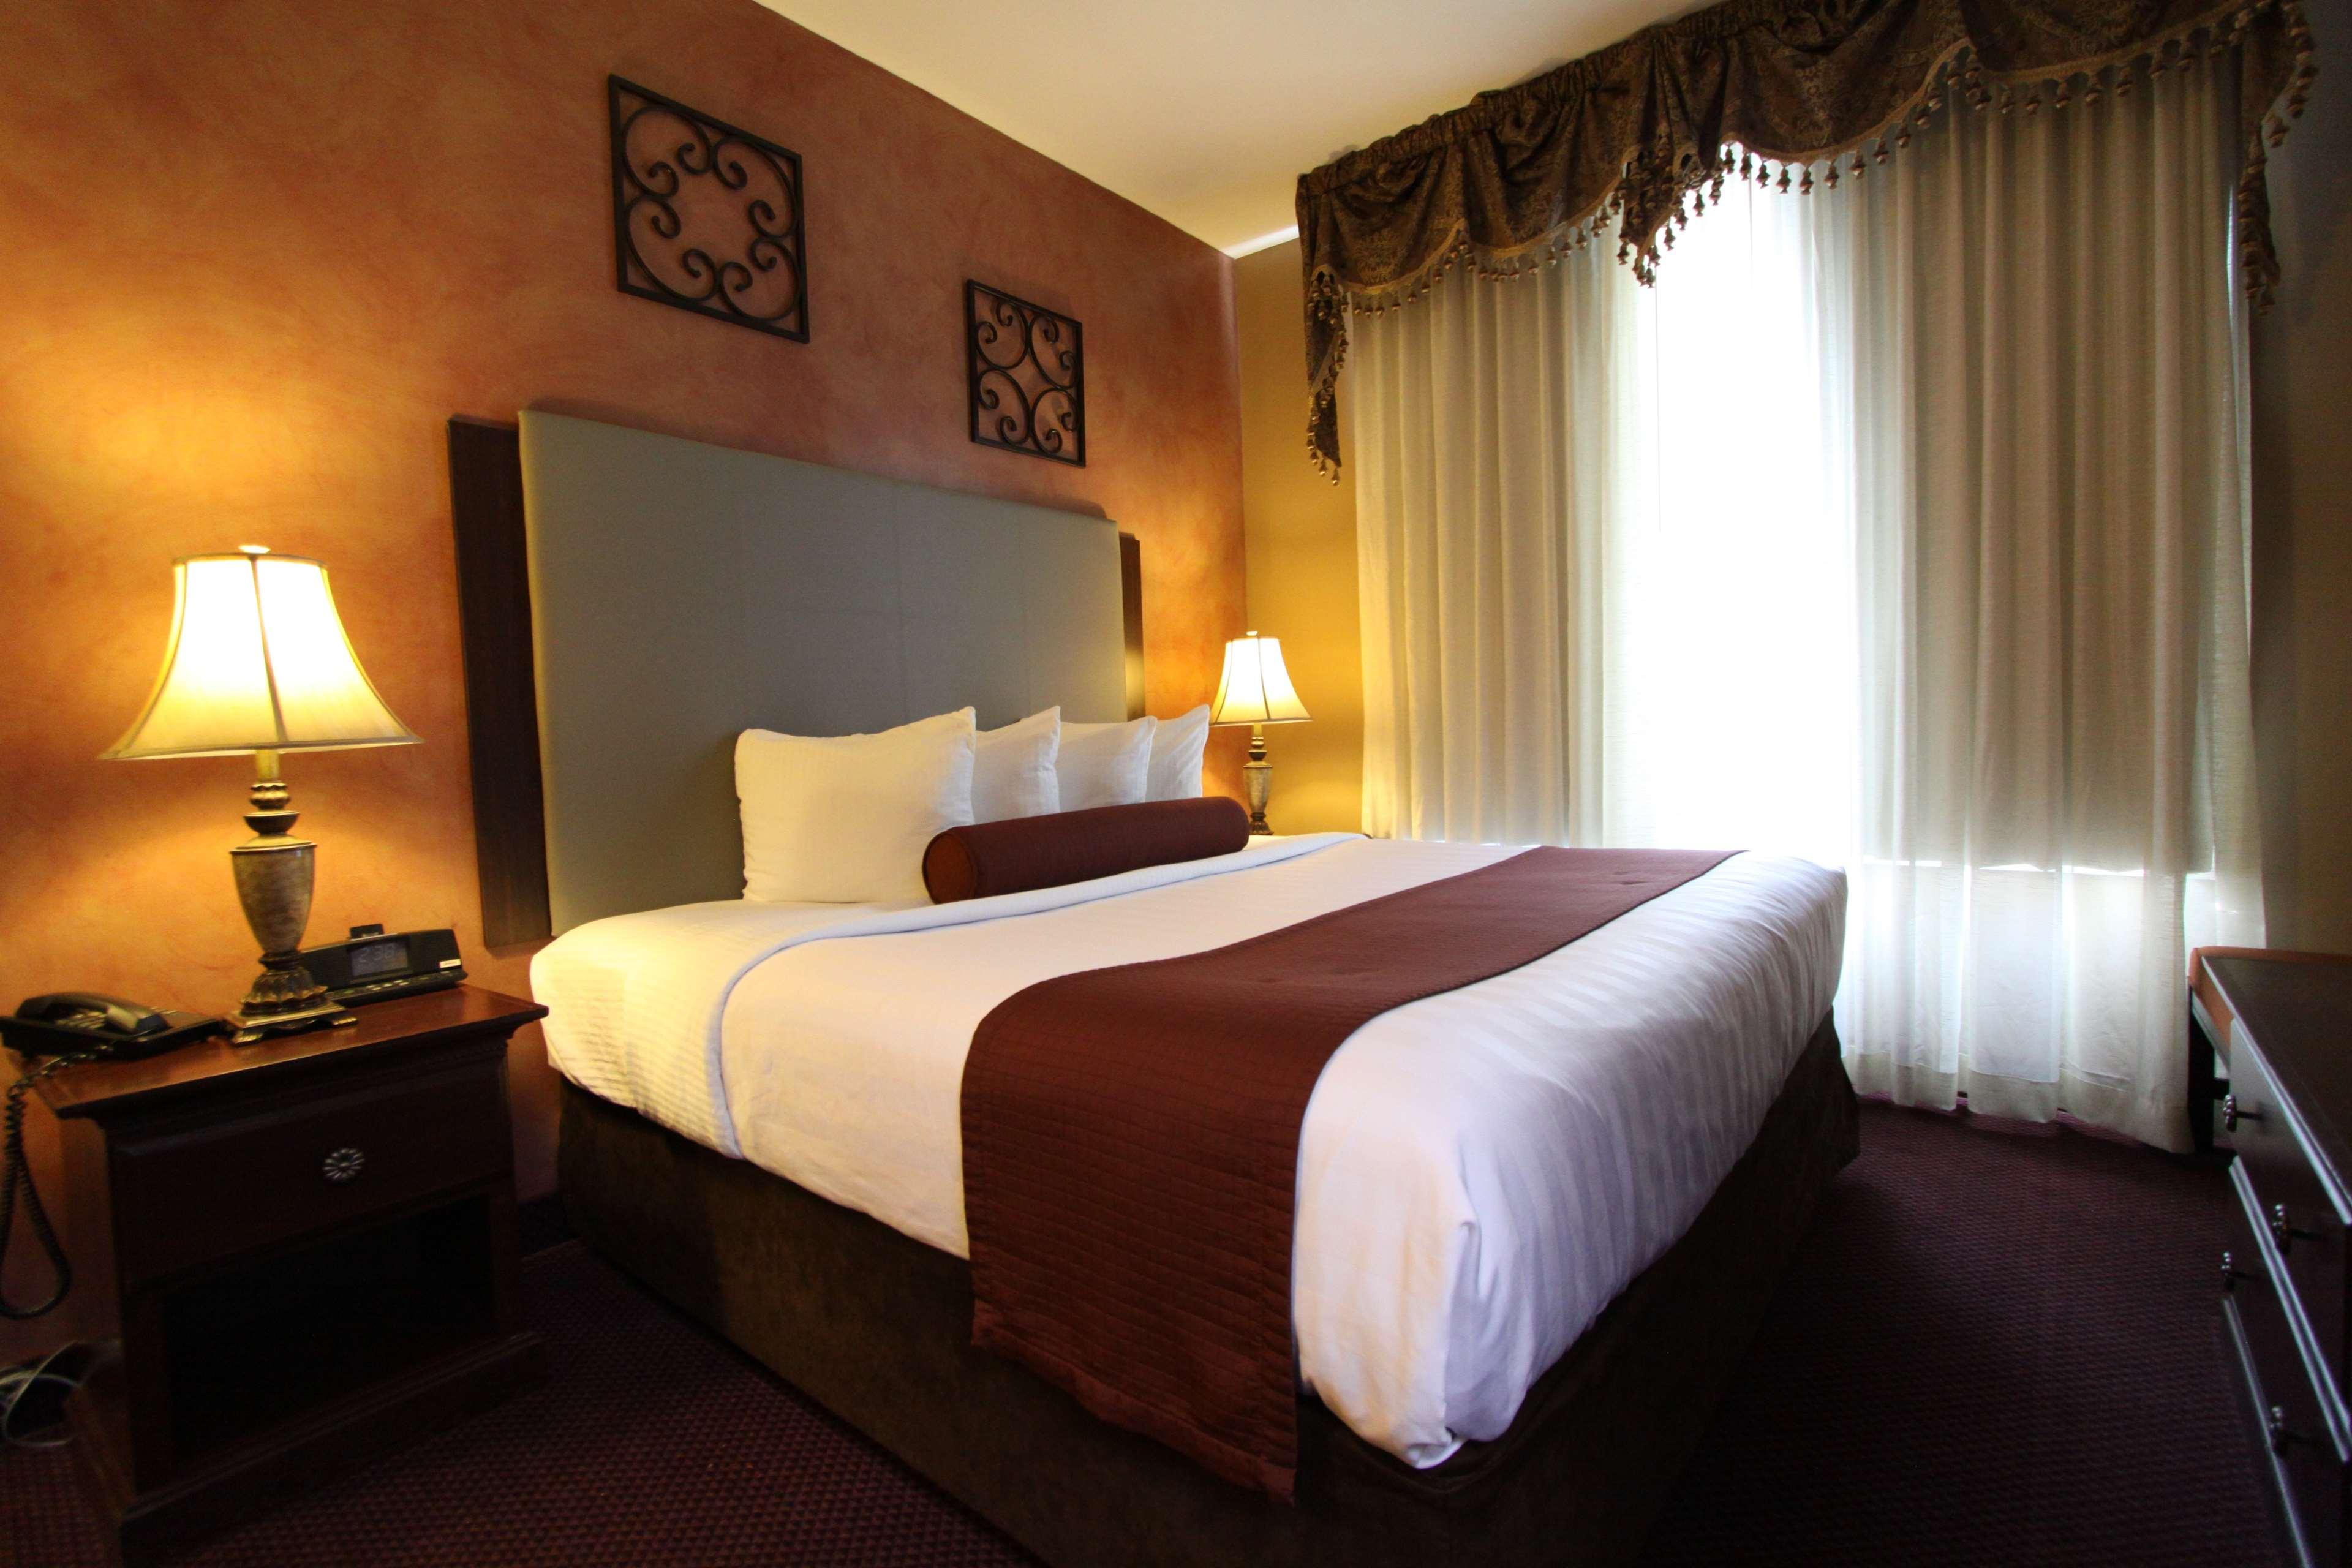 Best Western Plus Hannaford Inn & Suites image 24